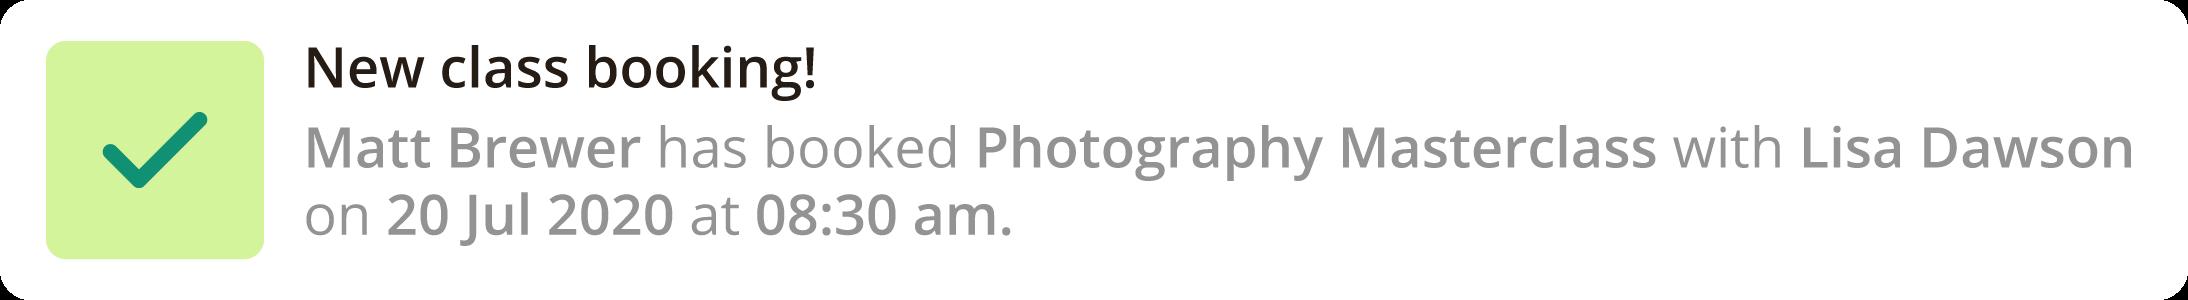 Online Booking Sample Notification